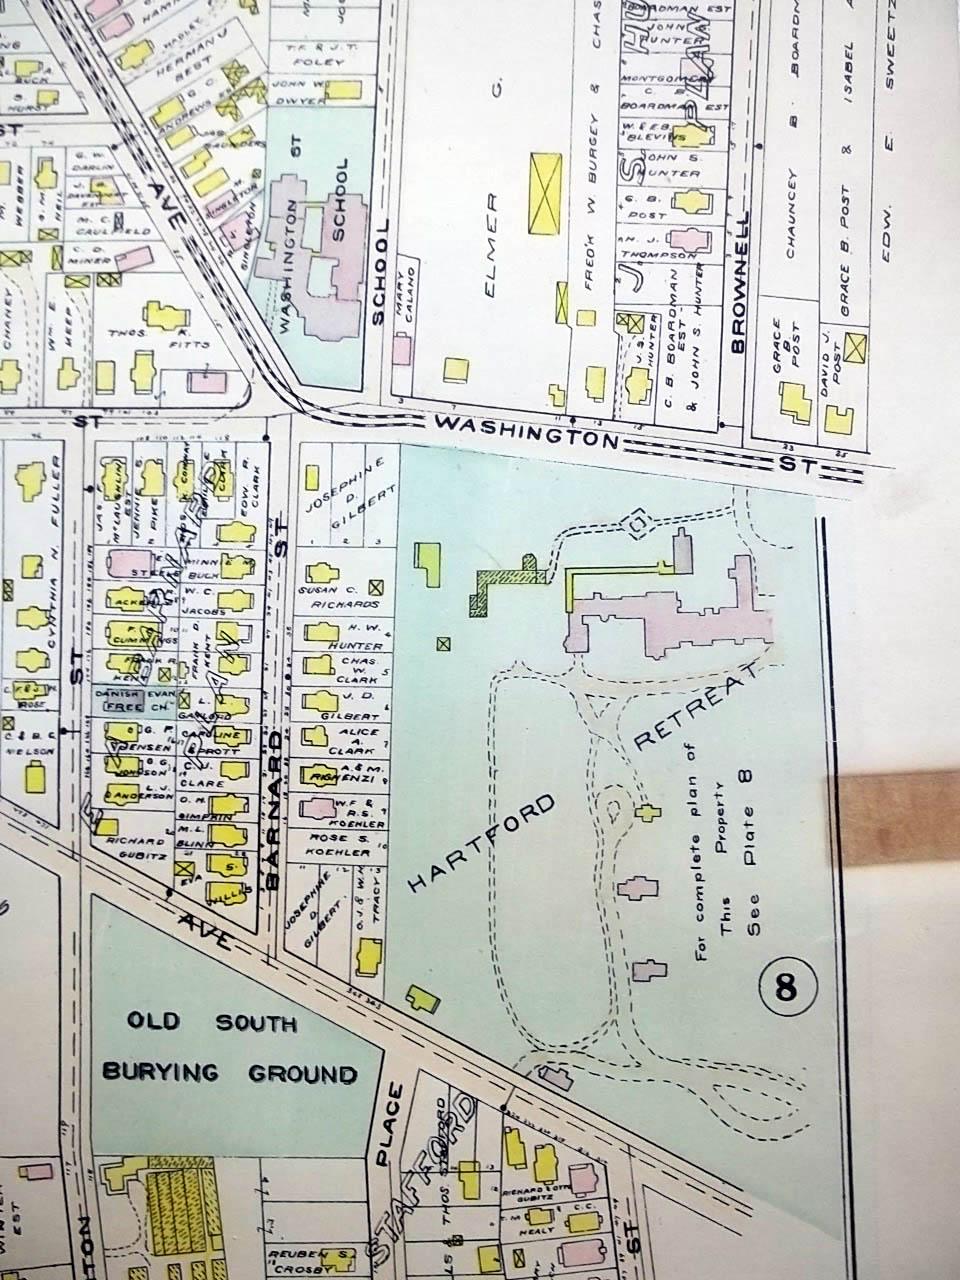 1909 Hartford CT Map: Hartford Retreat; Old South Burying Ground ++